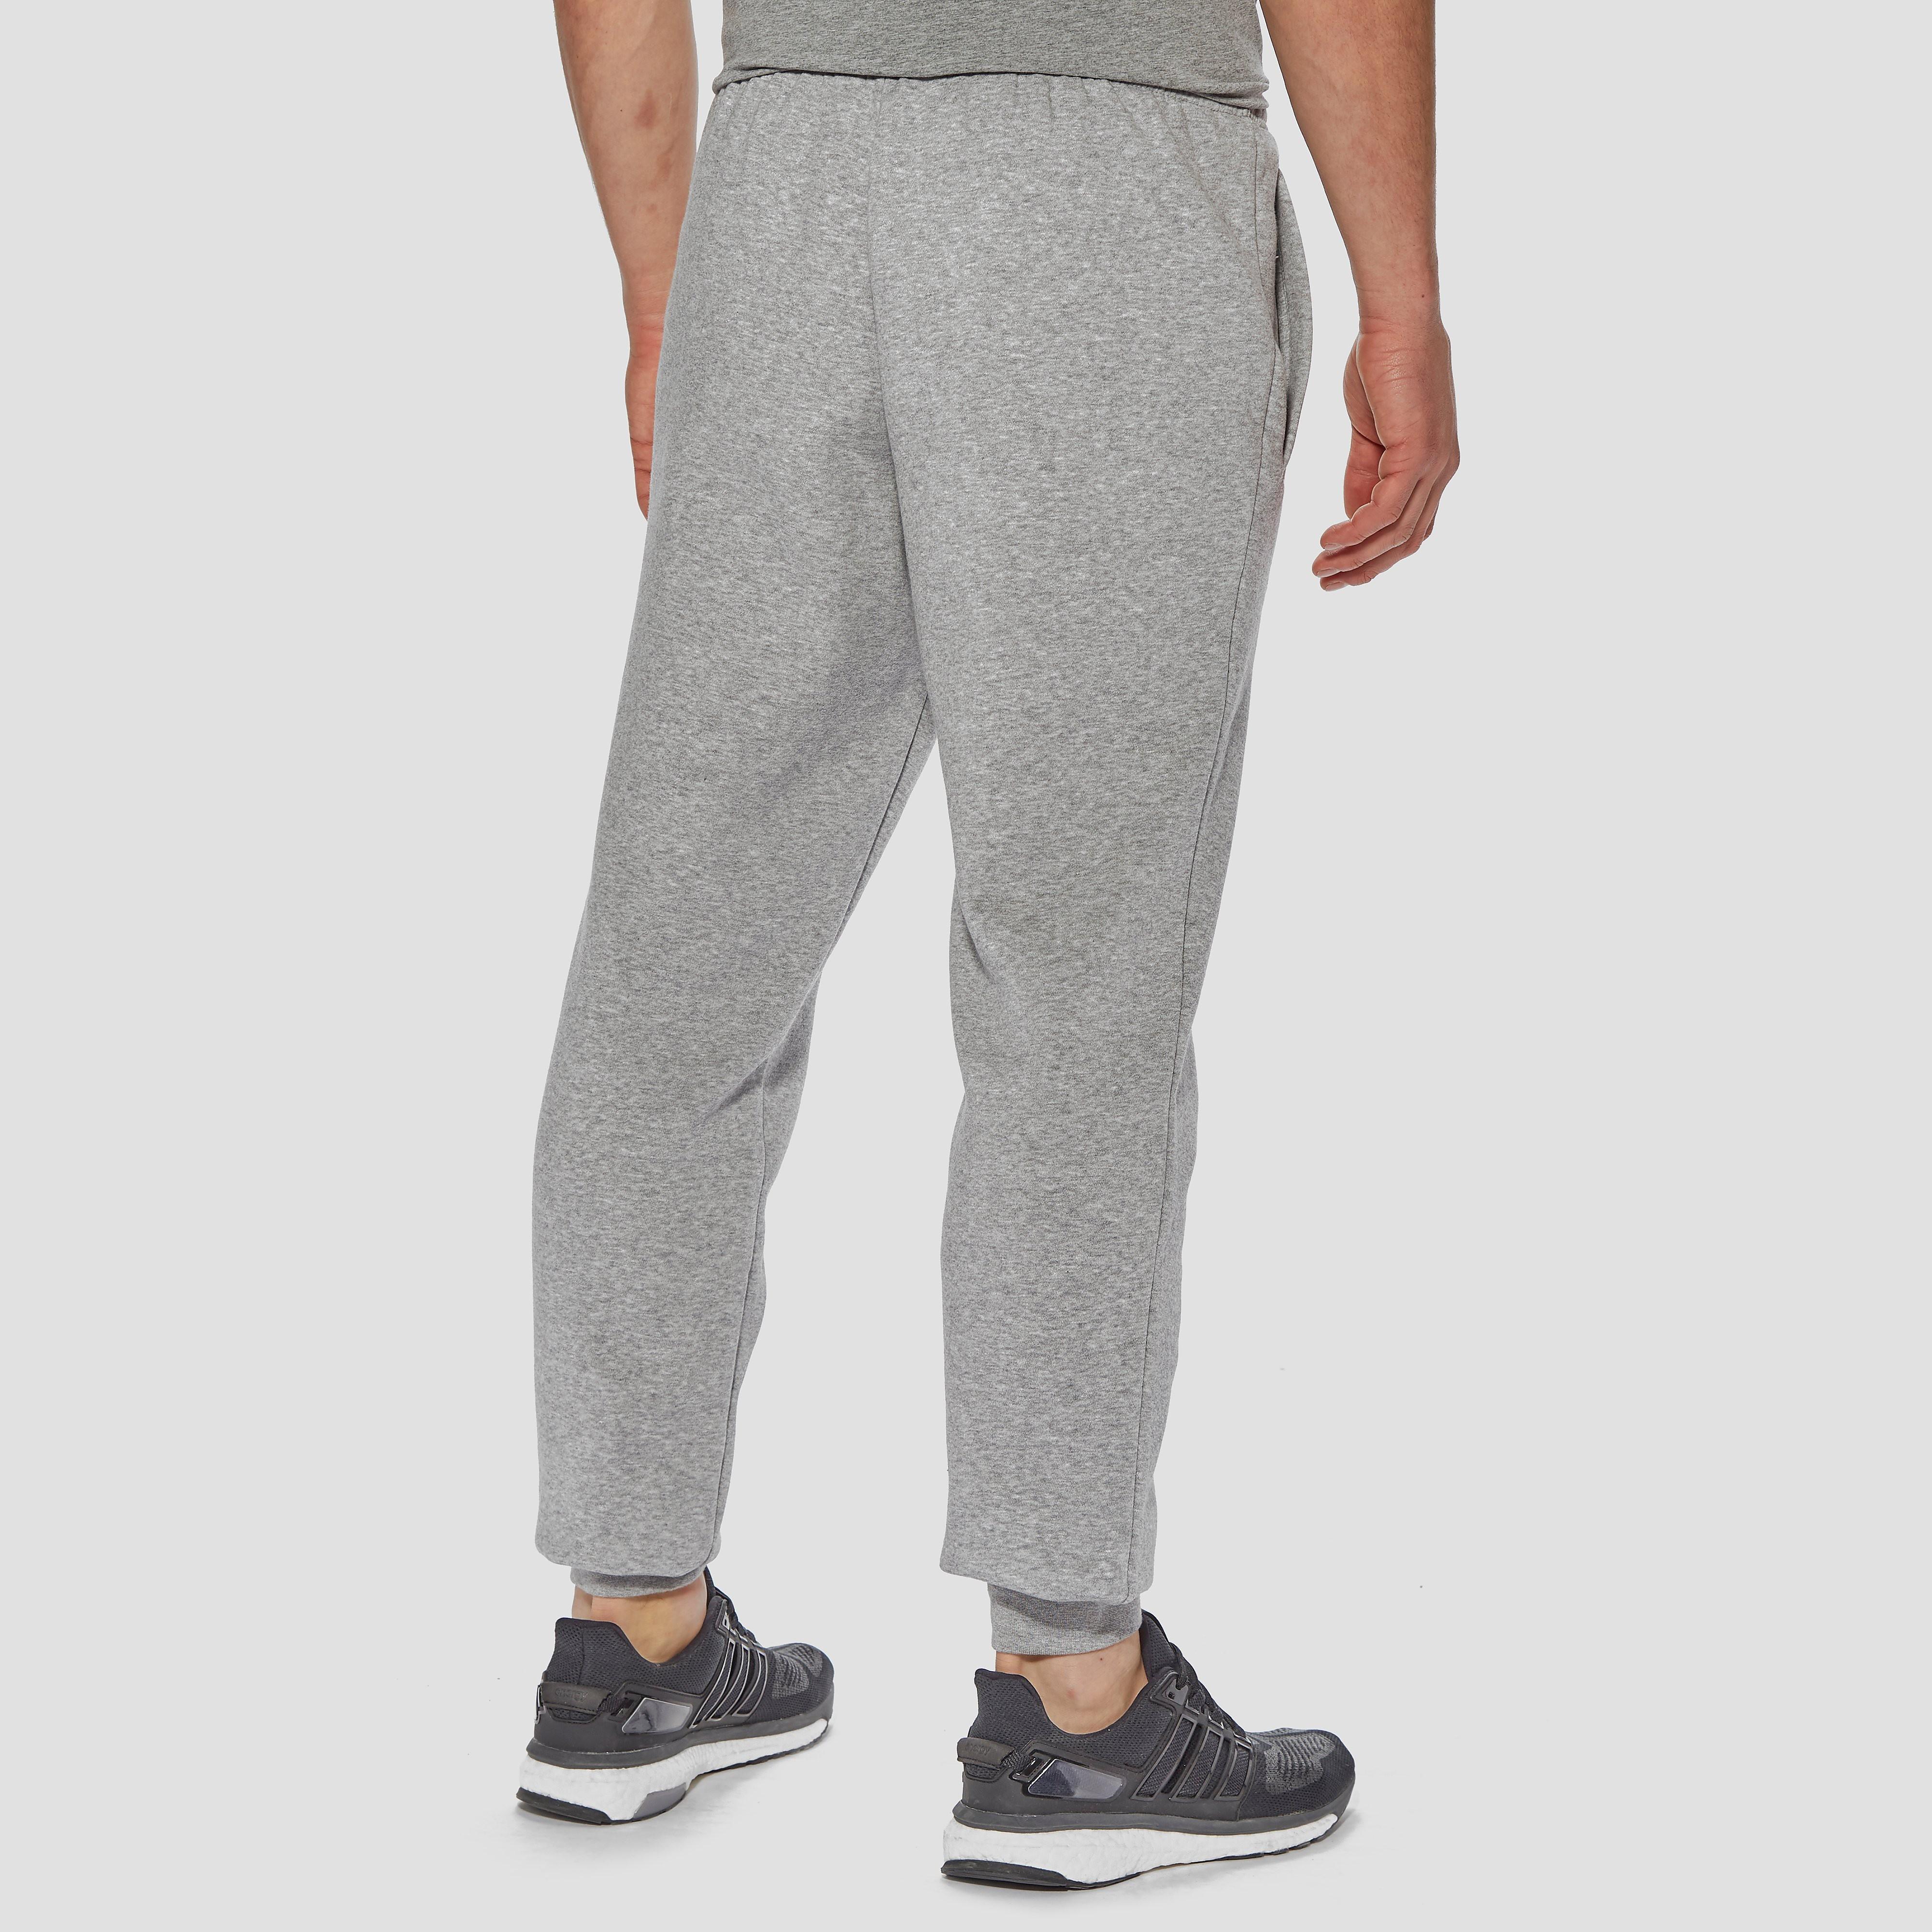 adidas Essential Men's Pants